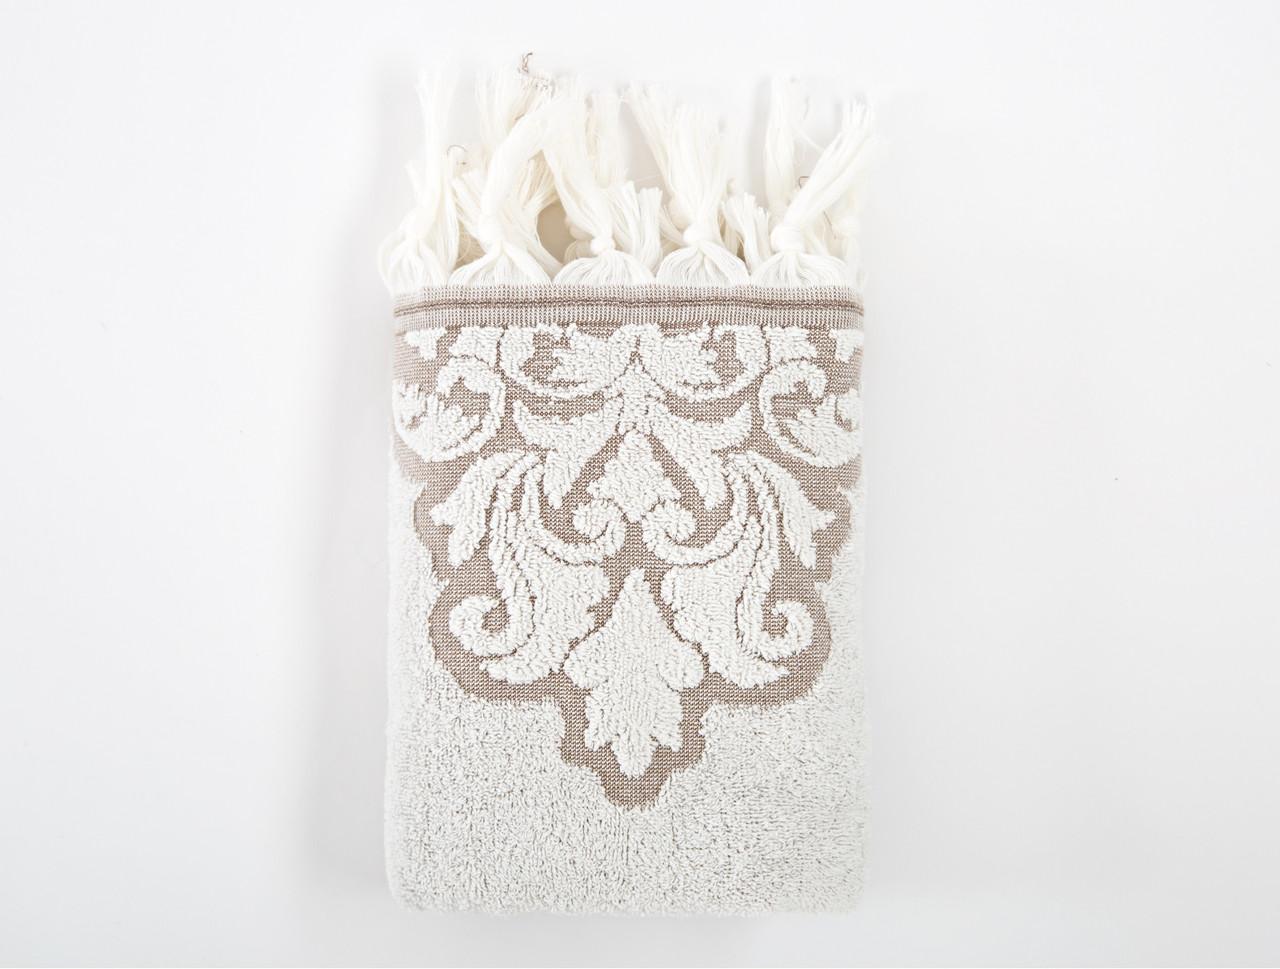 Полотенце Irya Jakarli - Vintage ekru молочный 70*130